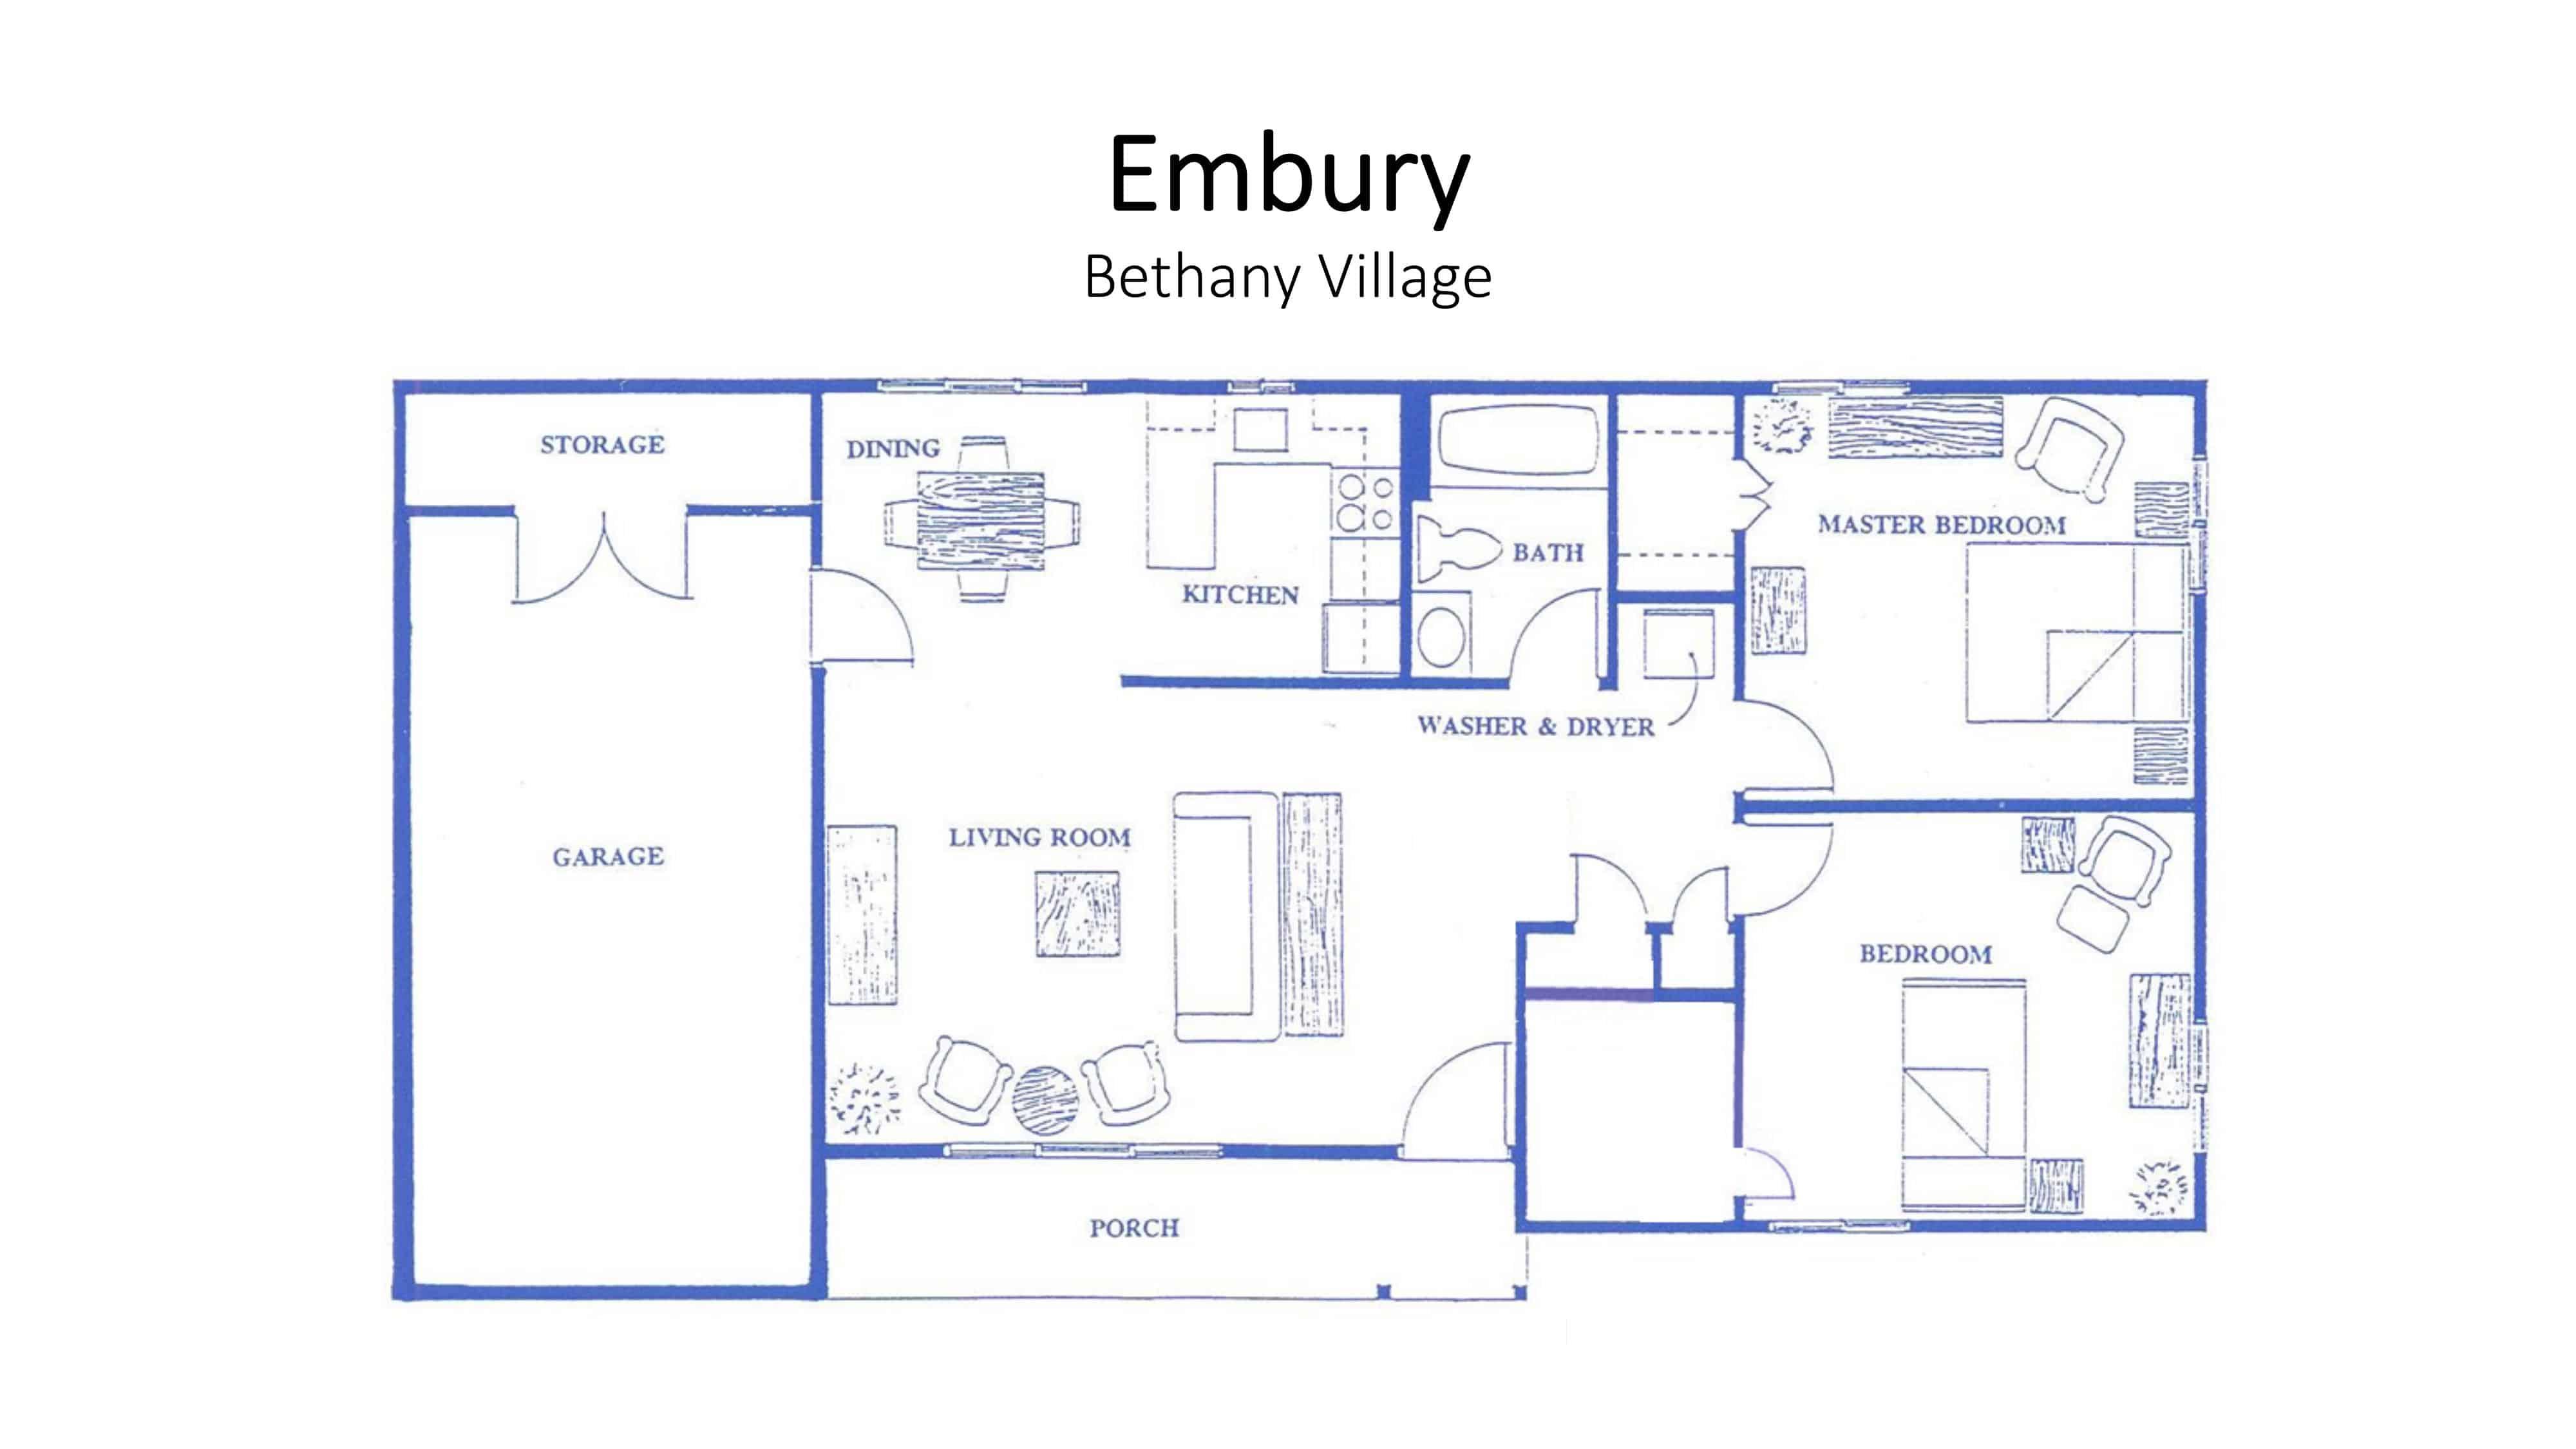 BV_Embury